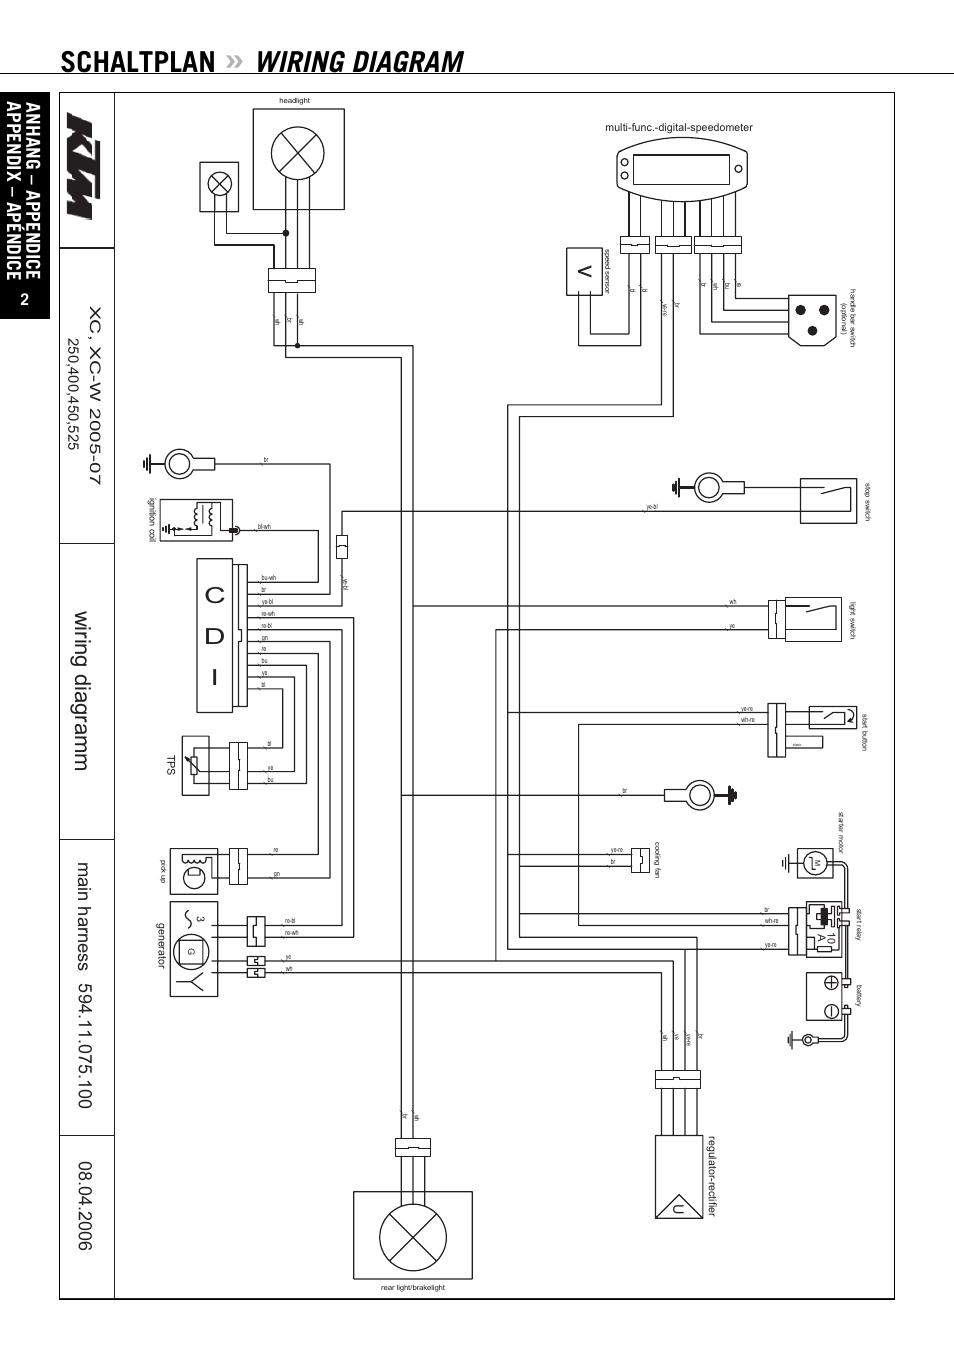 wiring diagram 1995 ktm wiring diagram data  1995 ktm wiring diagram wiring diagram str kawasaki wiring diagrams ktm 250 wiring diagram wiring library